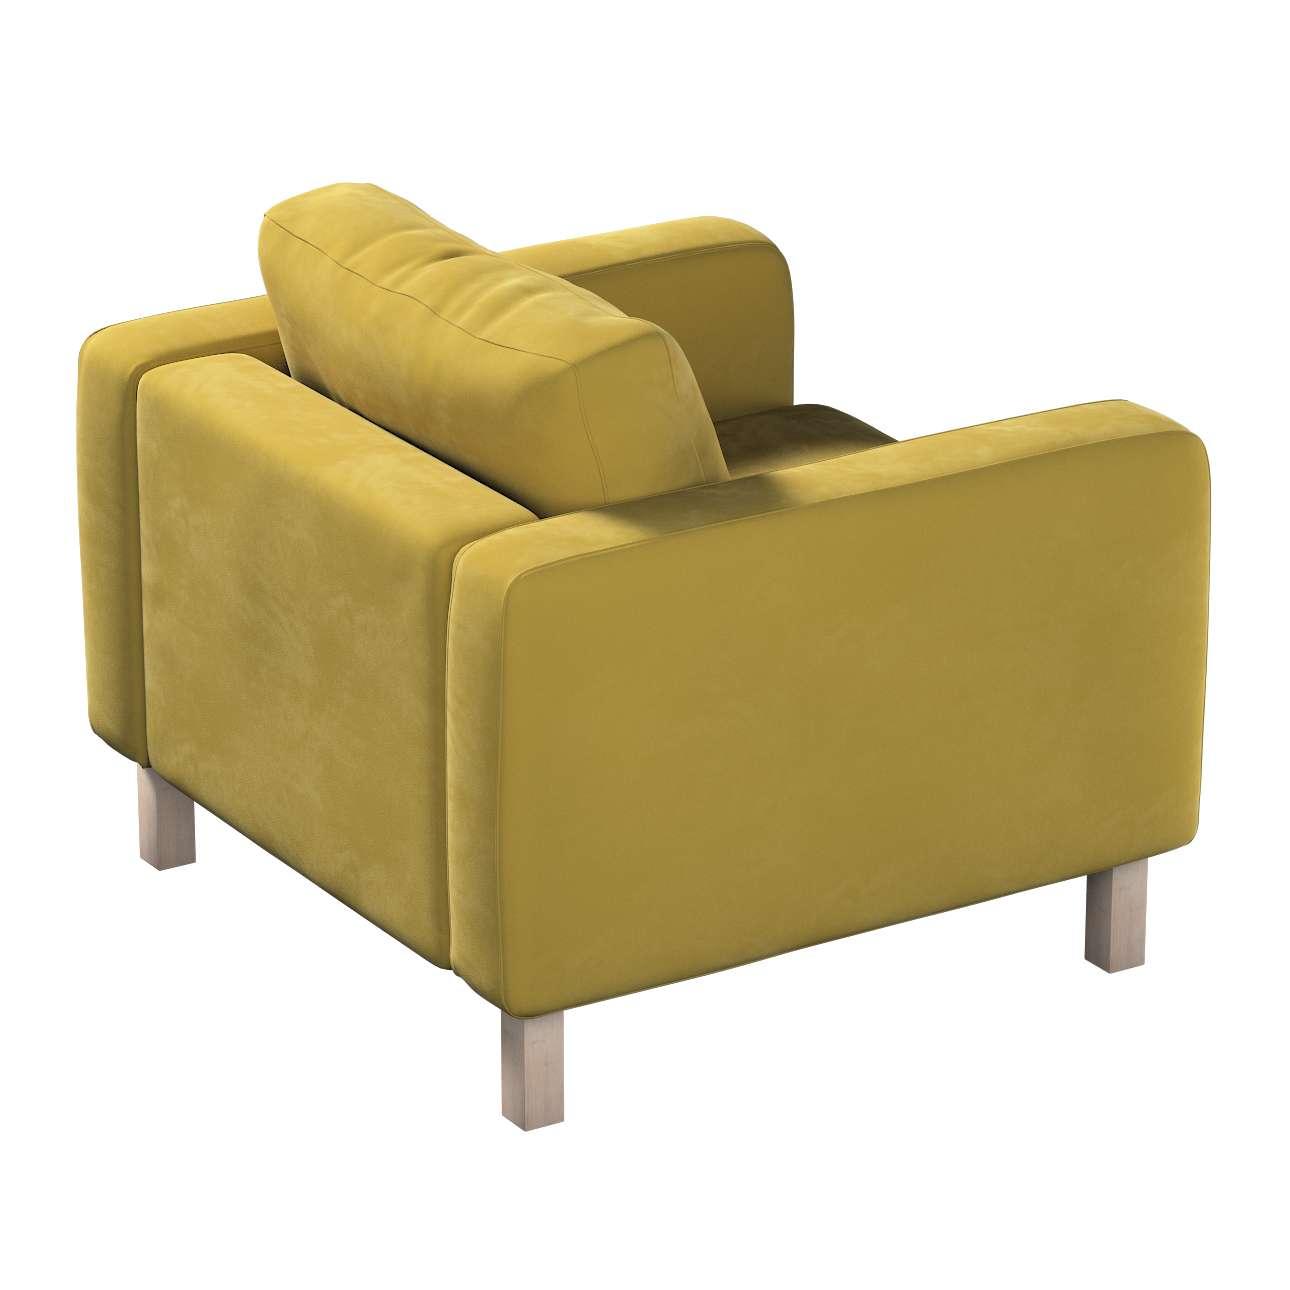 Pokrowiec na fotel Karlstad, krótki w kolekcji Velvet, tkanina: 704-27